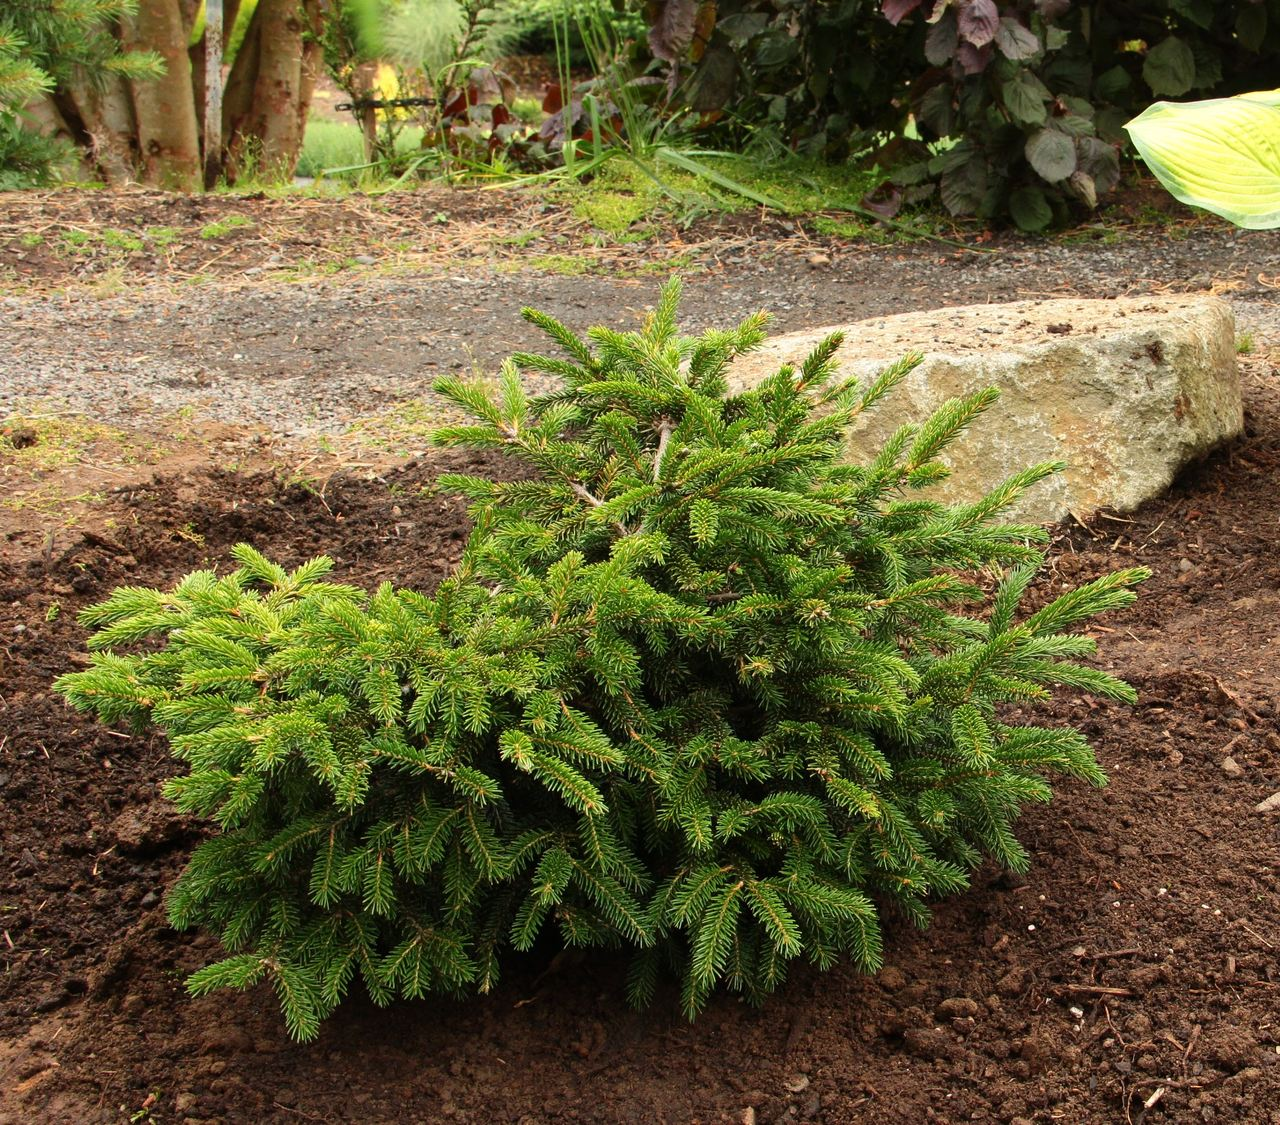 Picea orientalis Ferny Creek Prostrate spruce evergreen conifer flat spreading Caucasian spruce green needles